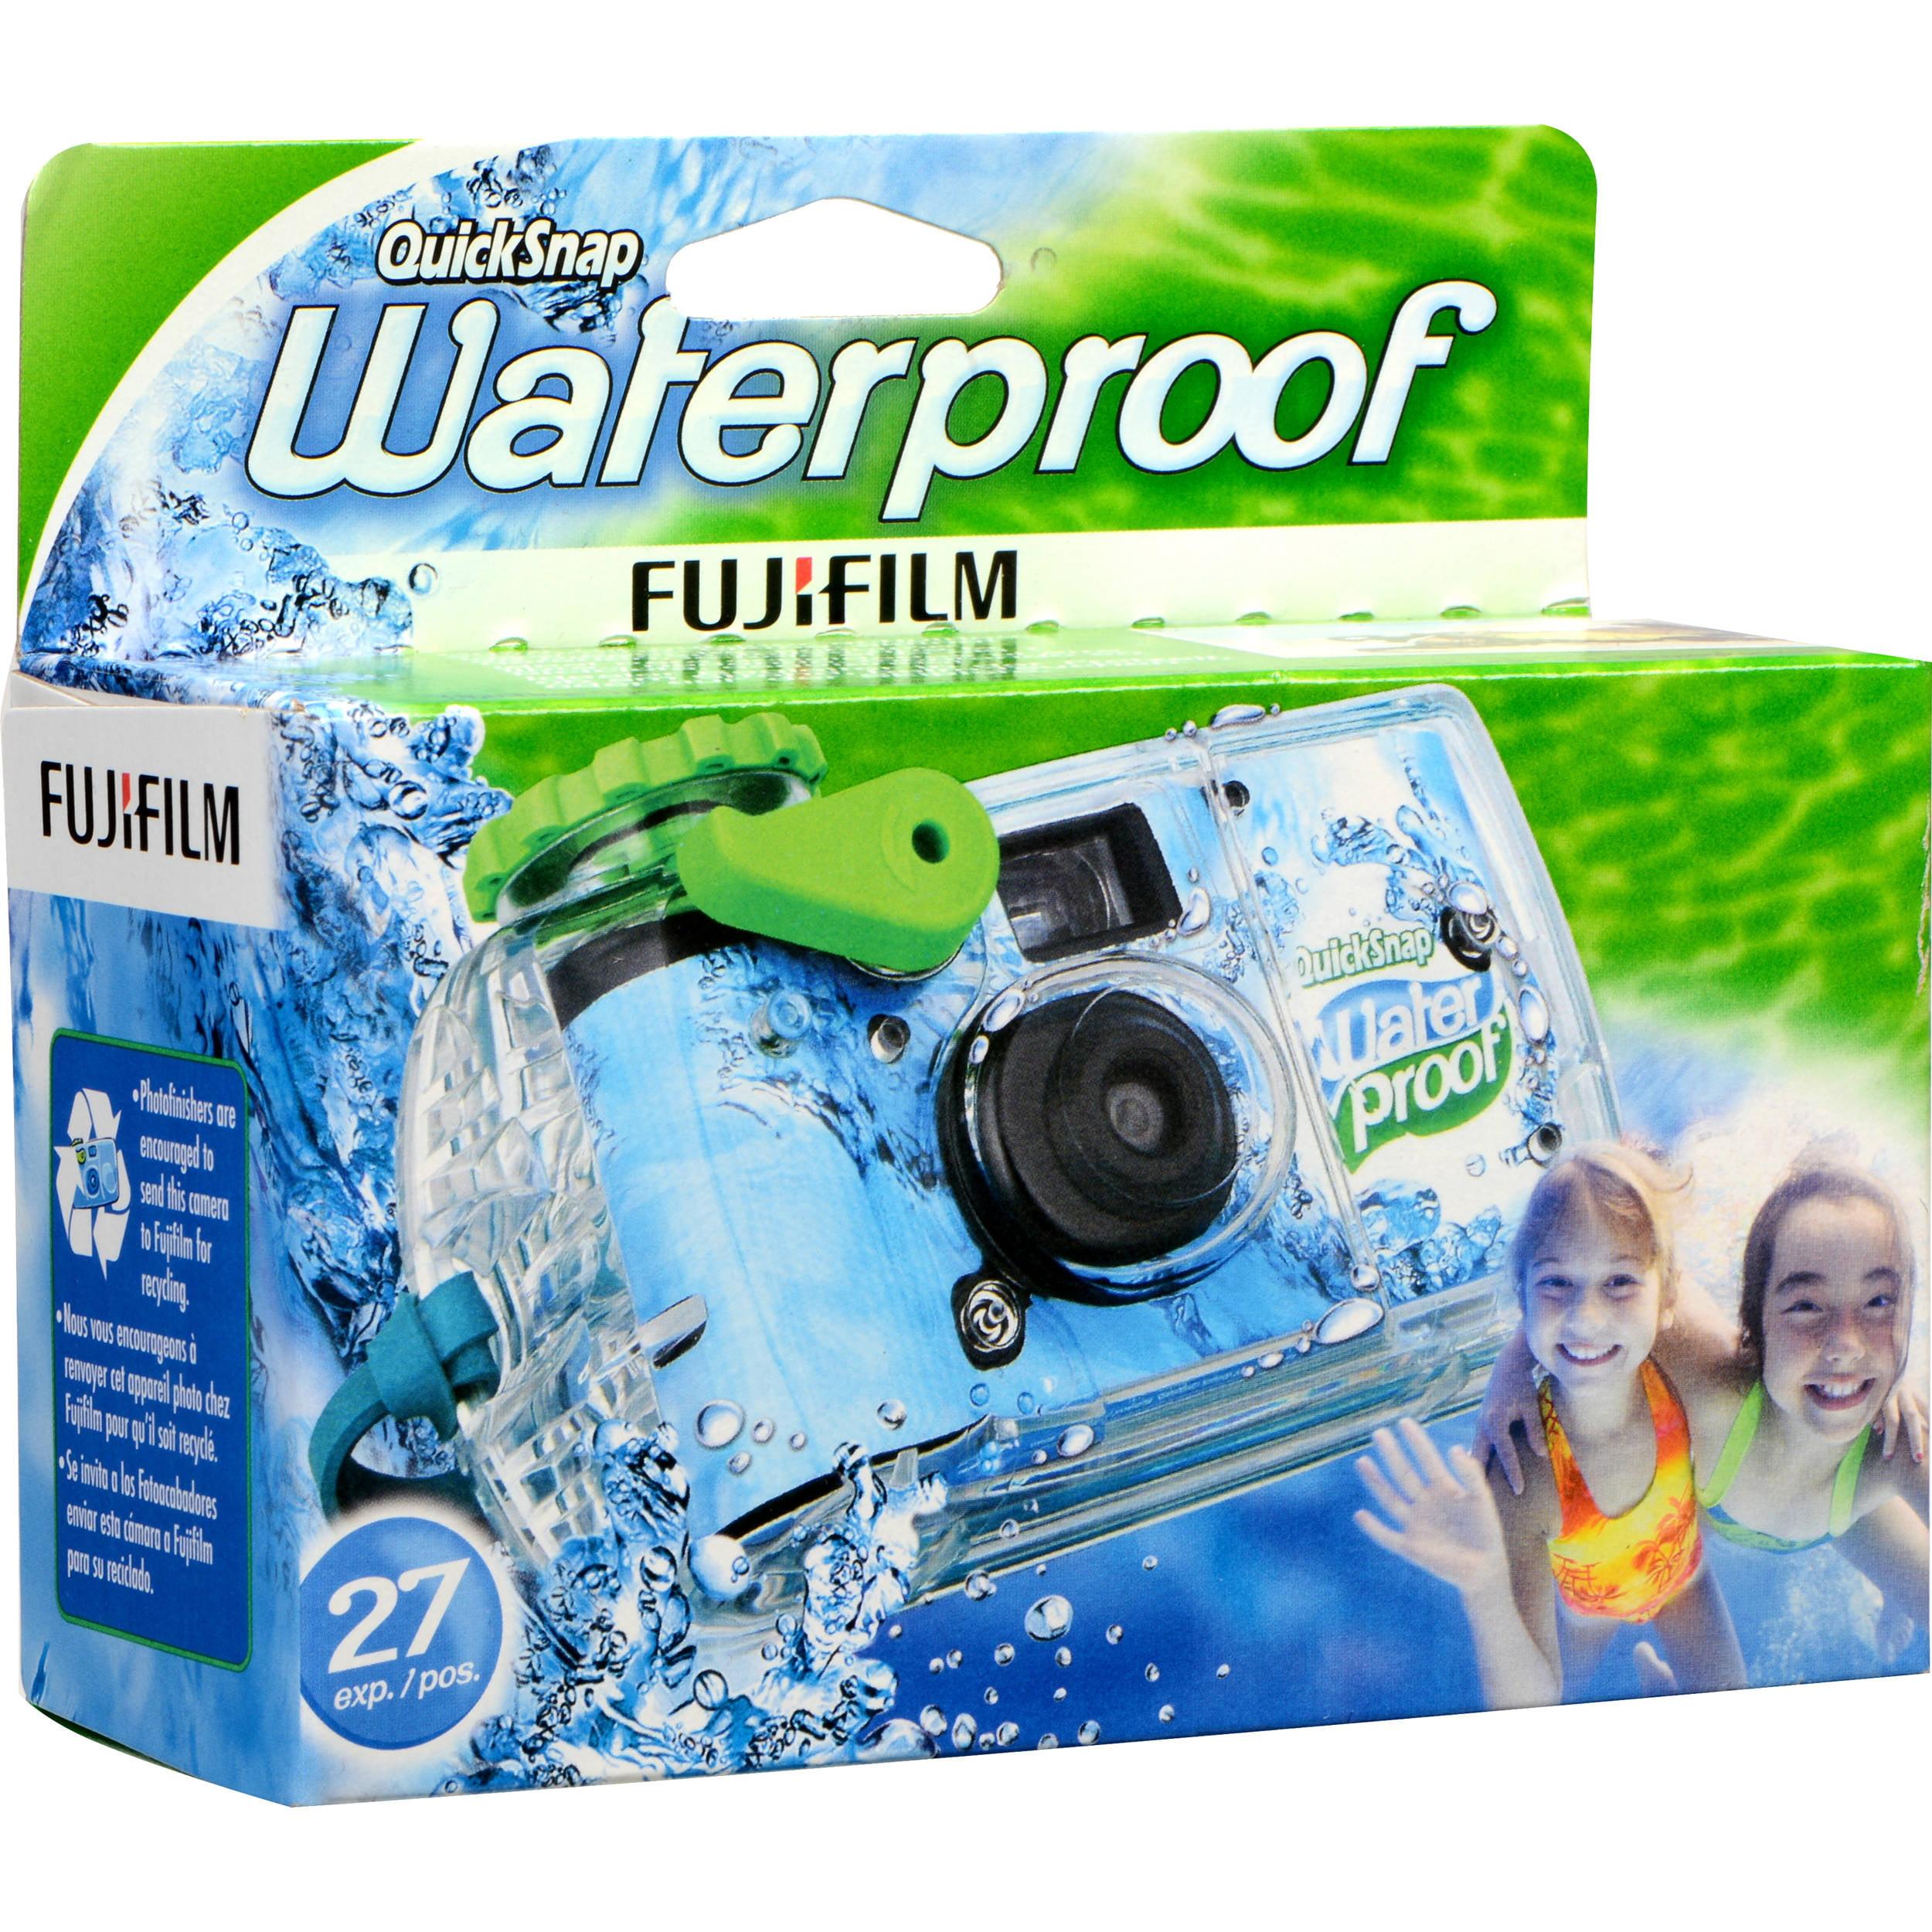 Waterproof Cameras Underwater Camera Wiring Diagram Fujifilm Quicksnap 800 35mm Disposable 27 Exposures